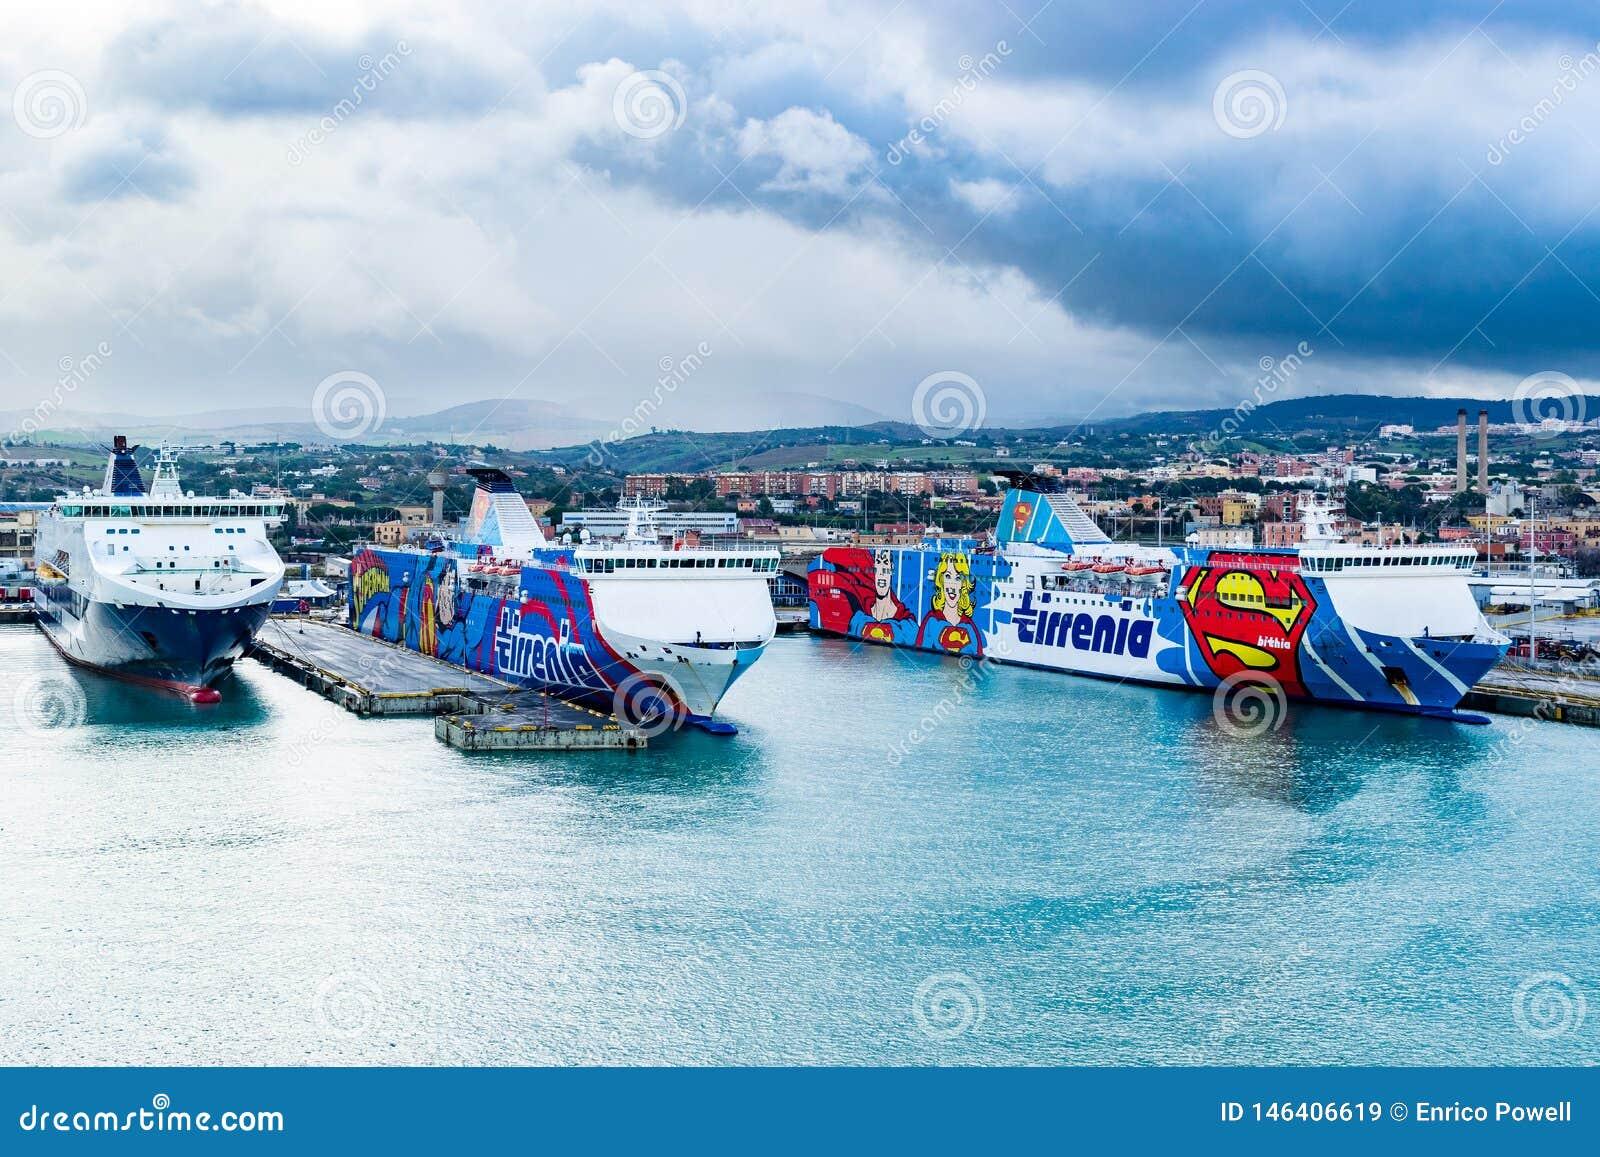 Grimaldi Lines, Tirrenia Athara and Tirrenia Bithia ferries at the Port of Civitavecchia, Rome.